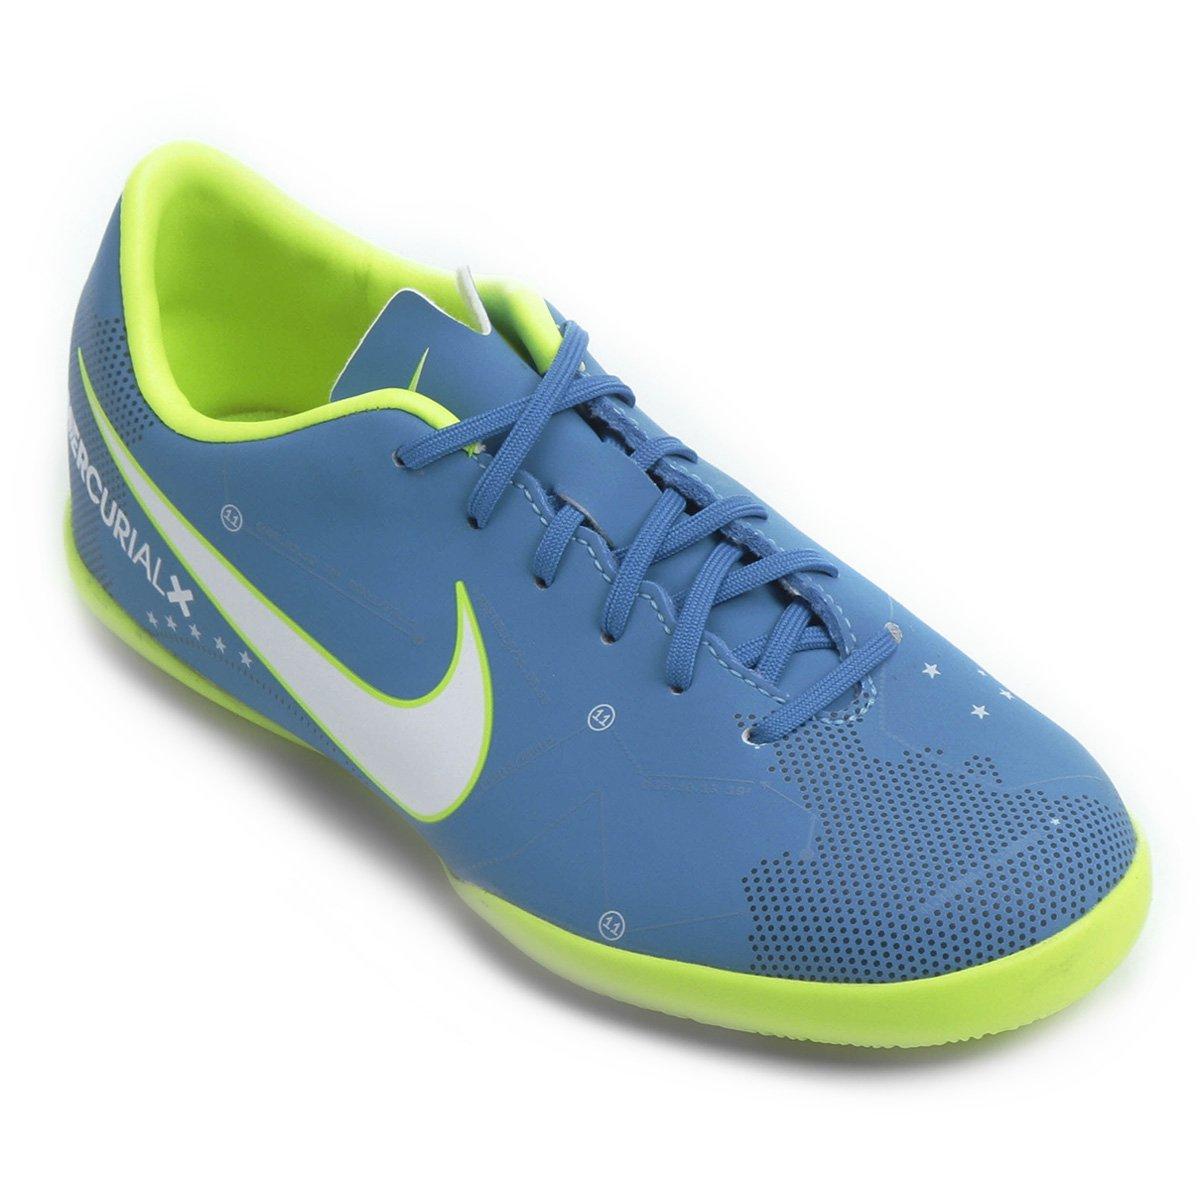 a1bc2ab1572ca Chuteira Futsal Infantil Nike Mercurial Victory 6 Neymar Jr IC - Azul e  Branco